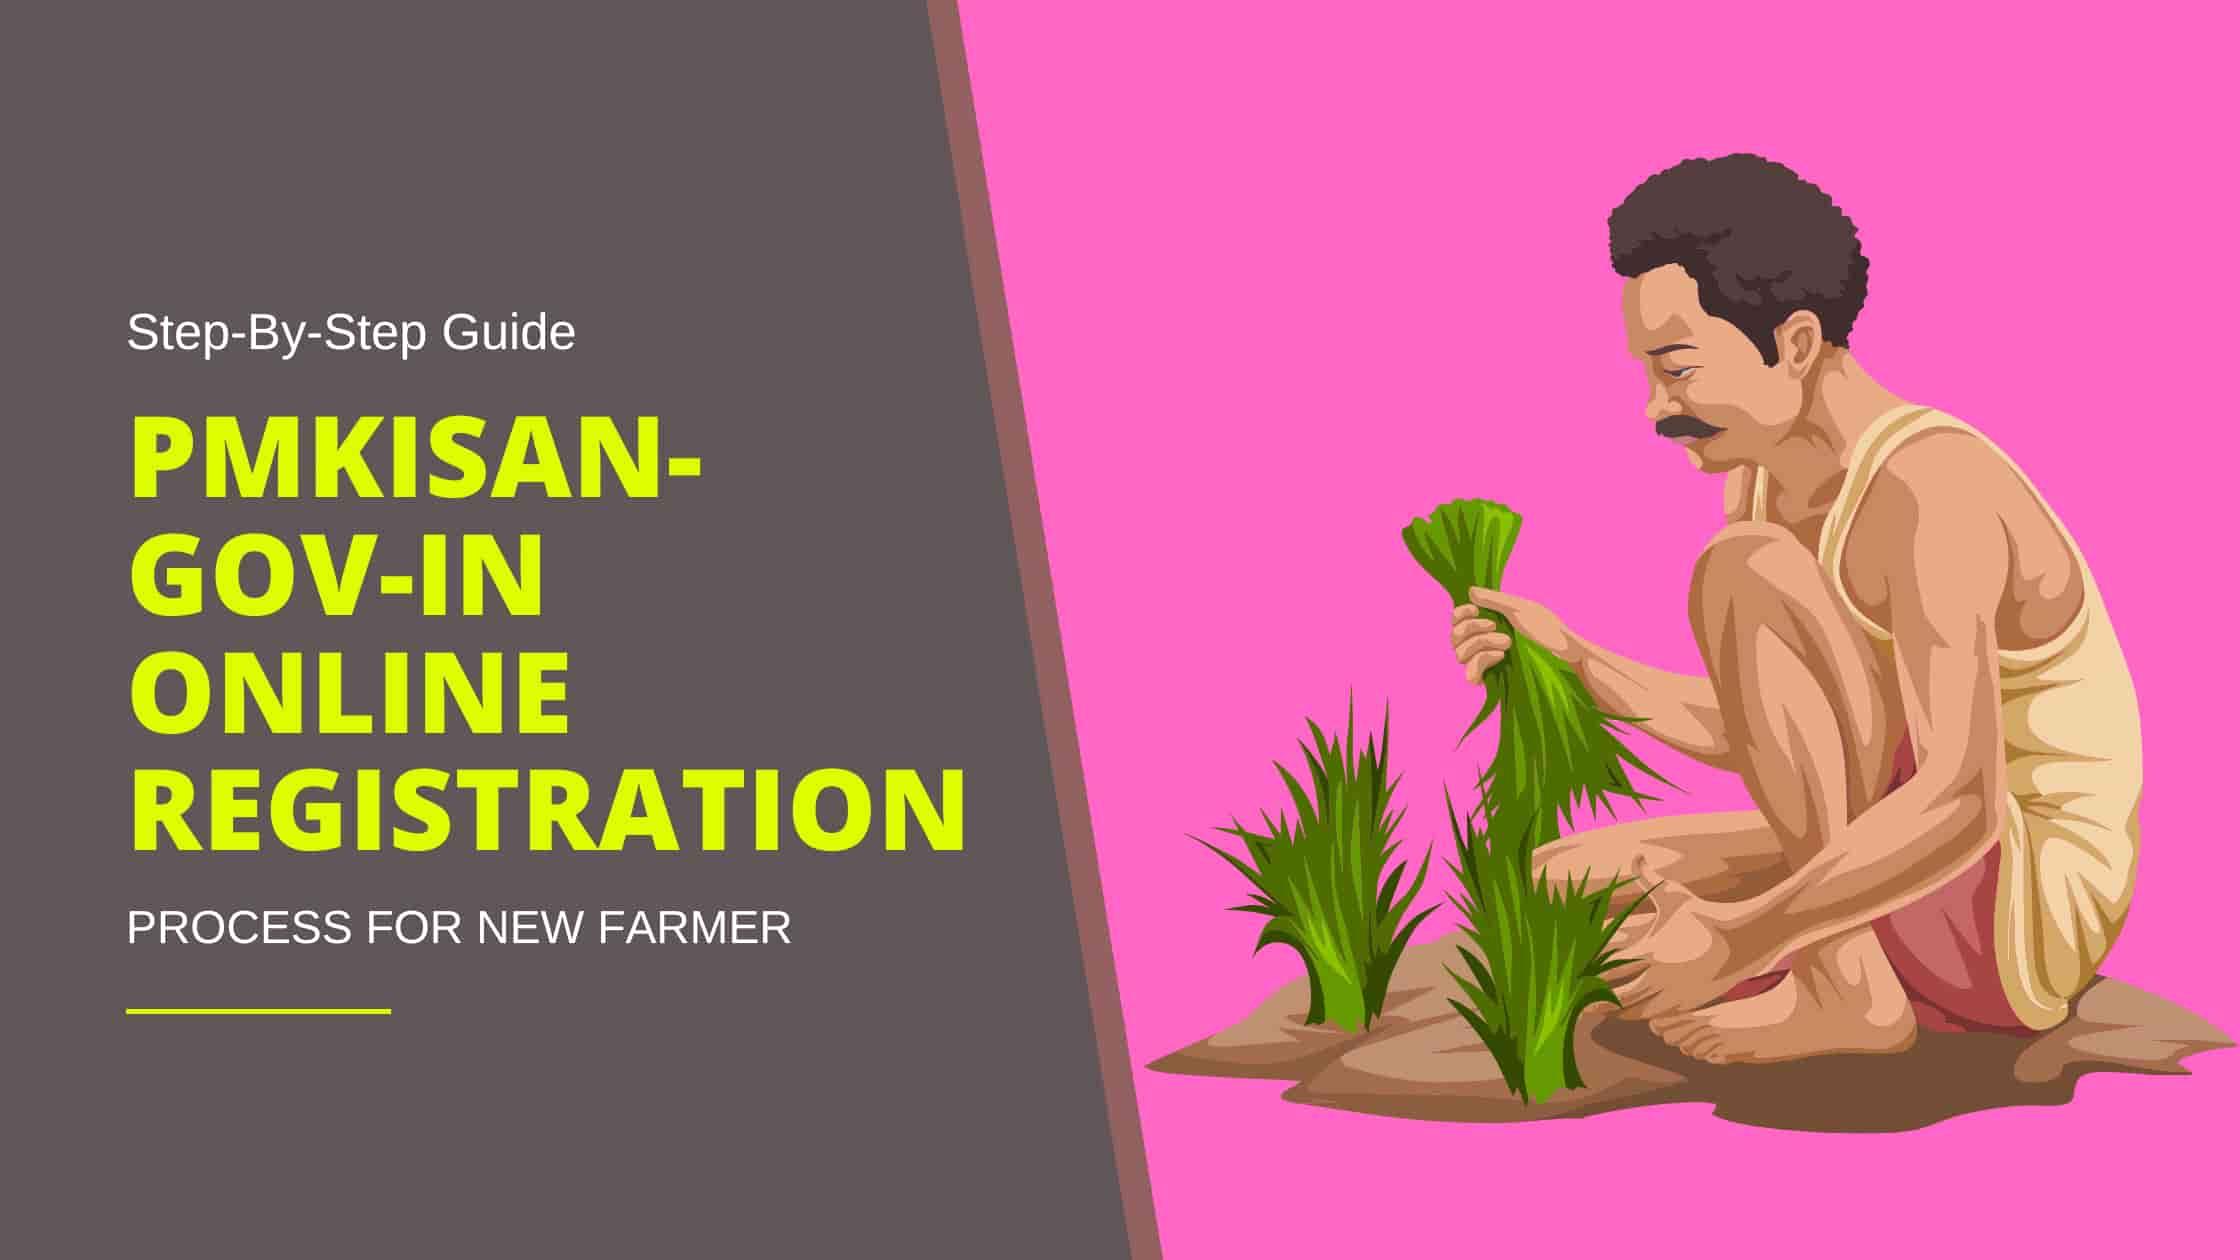 pmkisan.gov.in online registration process for new farmer